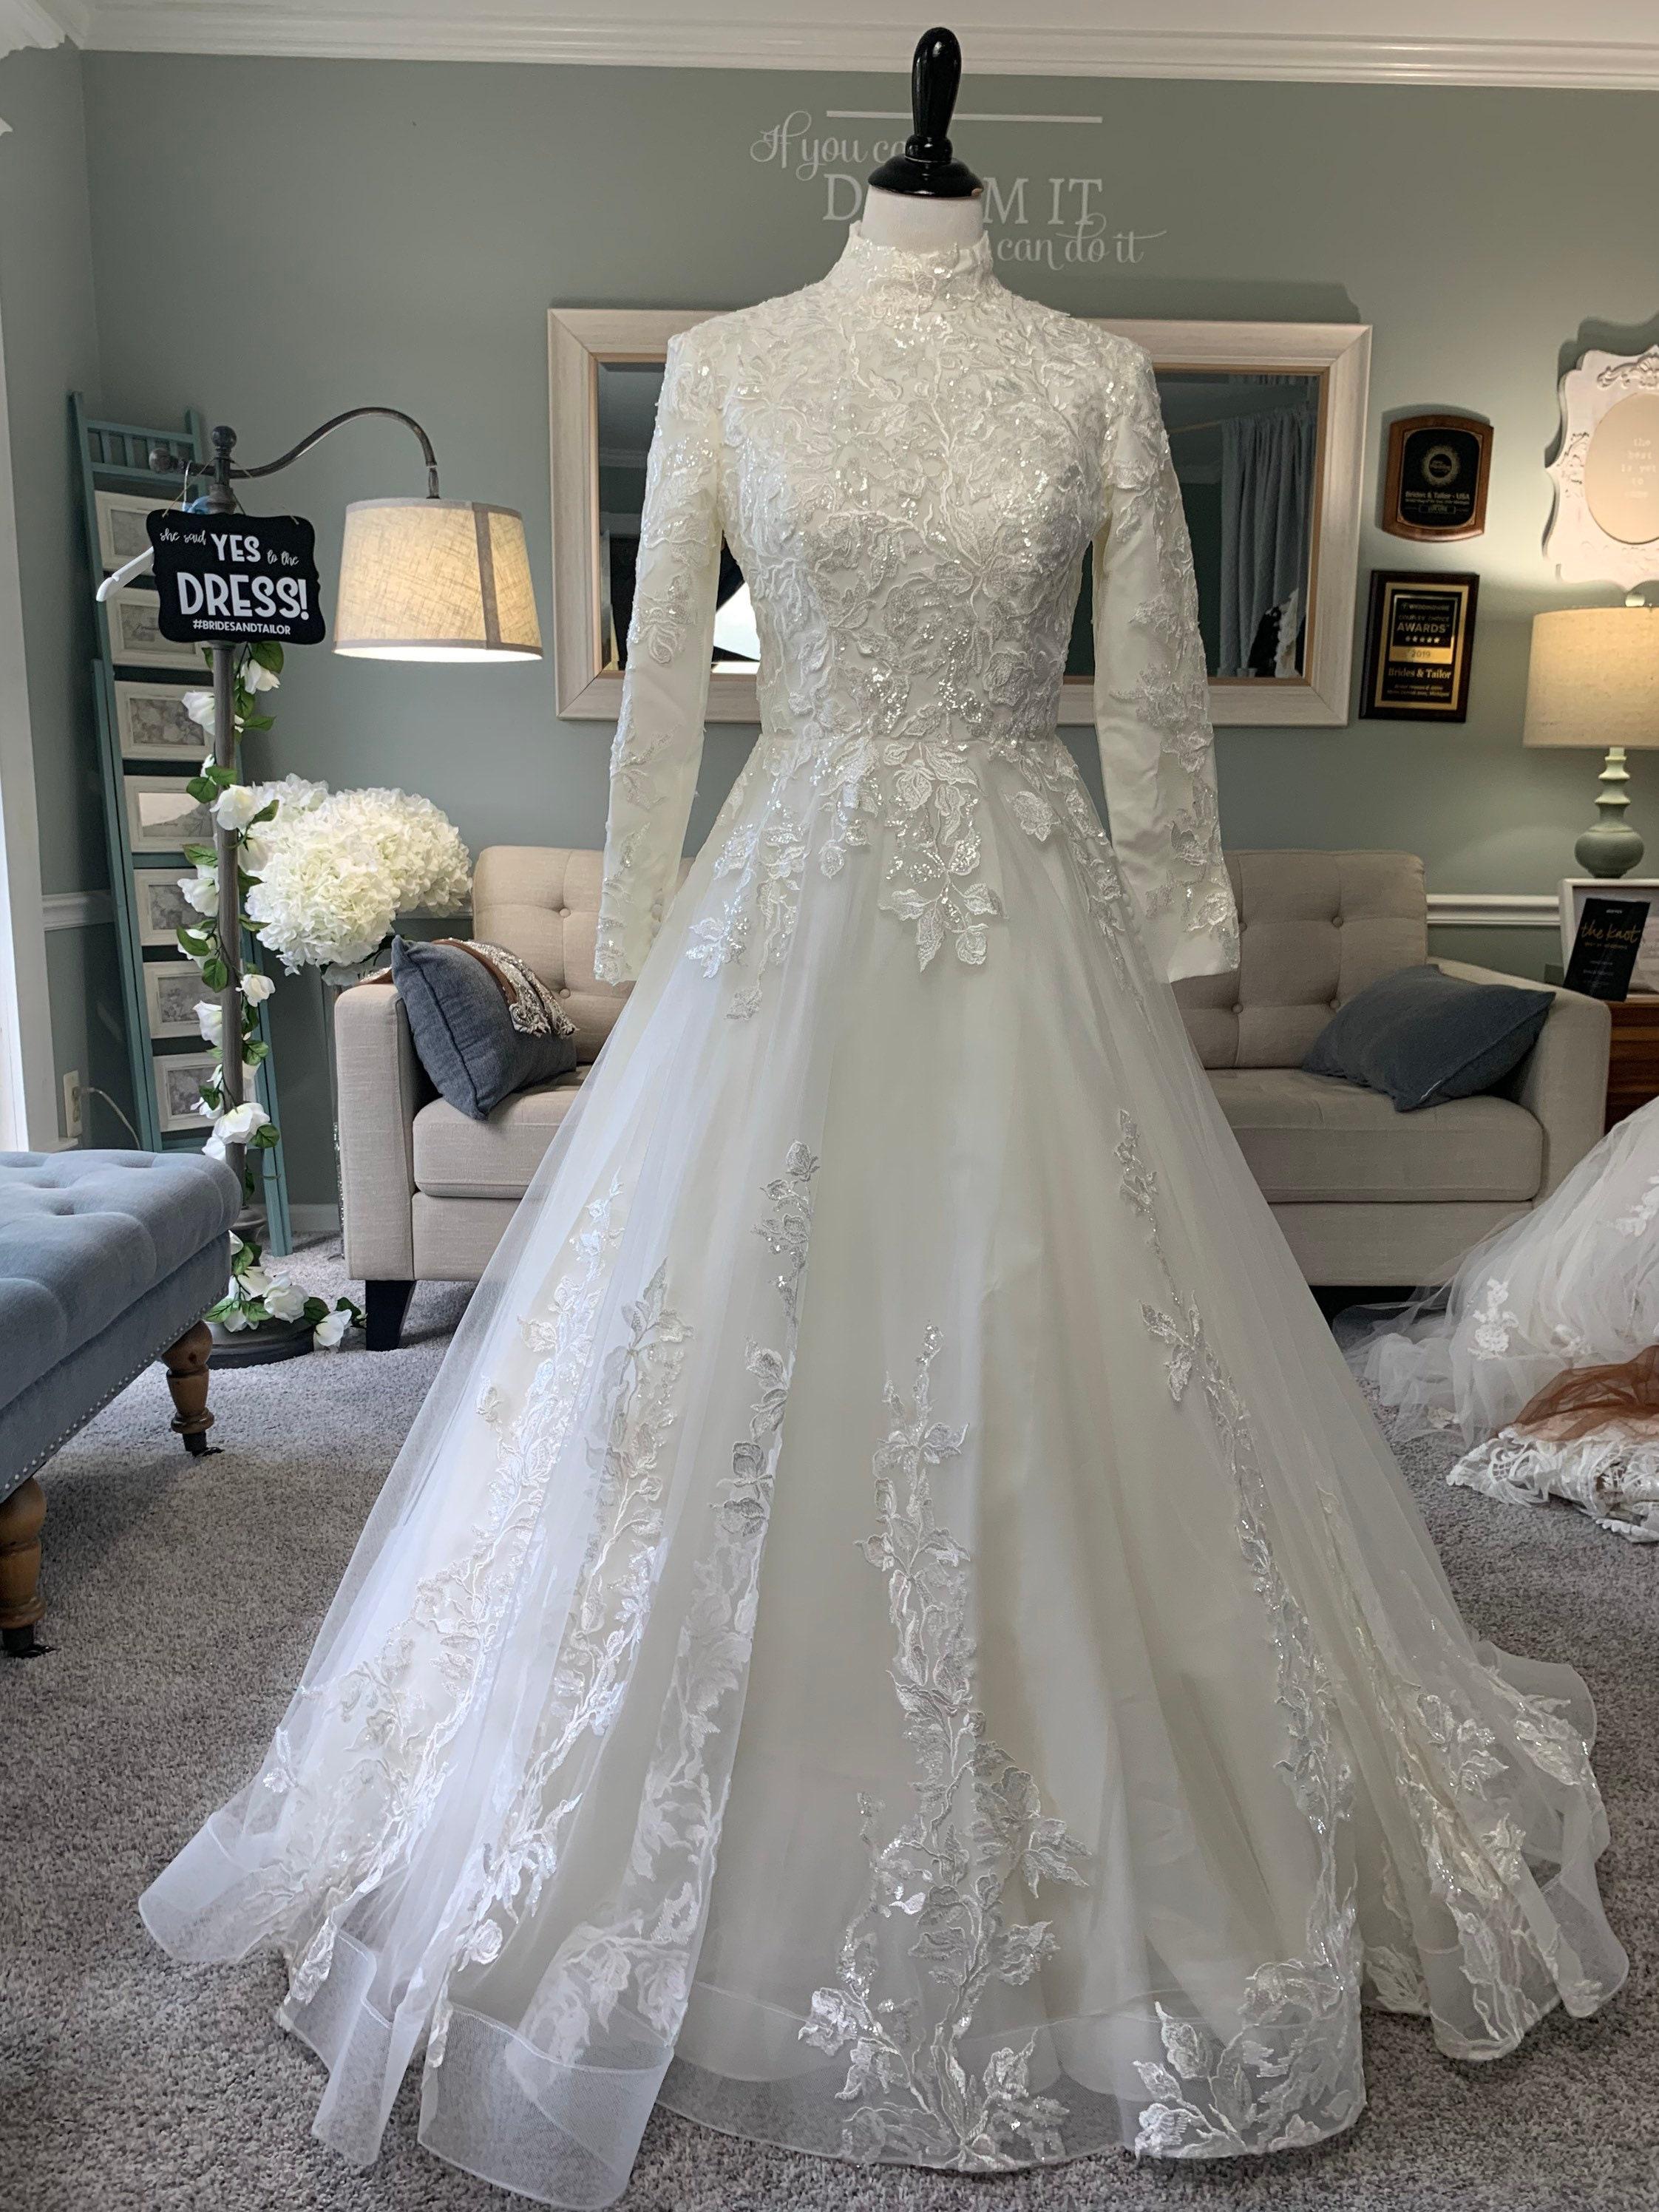 Modest Wedding Dress/ Hijab Wedding Dress / Hijab Friendly Wedding Dress  /Long Sleeves Wedding Dress /Modest Bridal Gown by Brides & Tailor